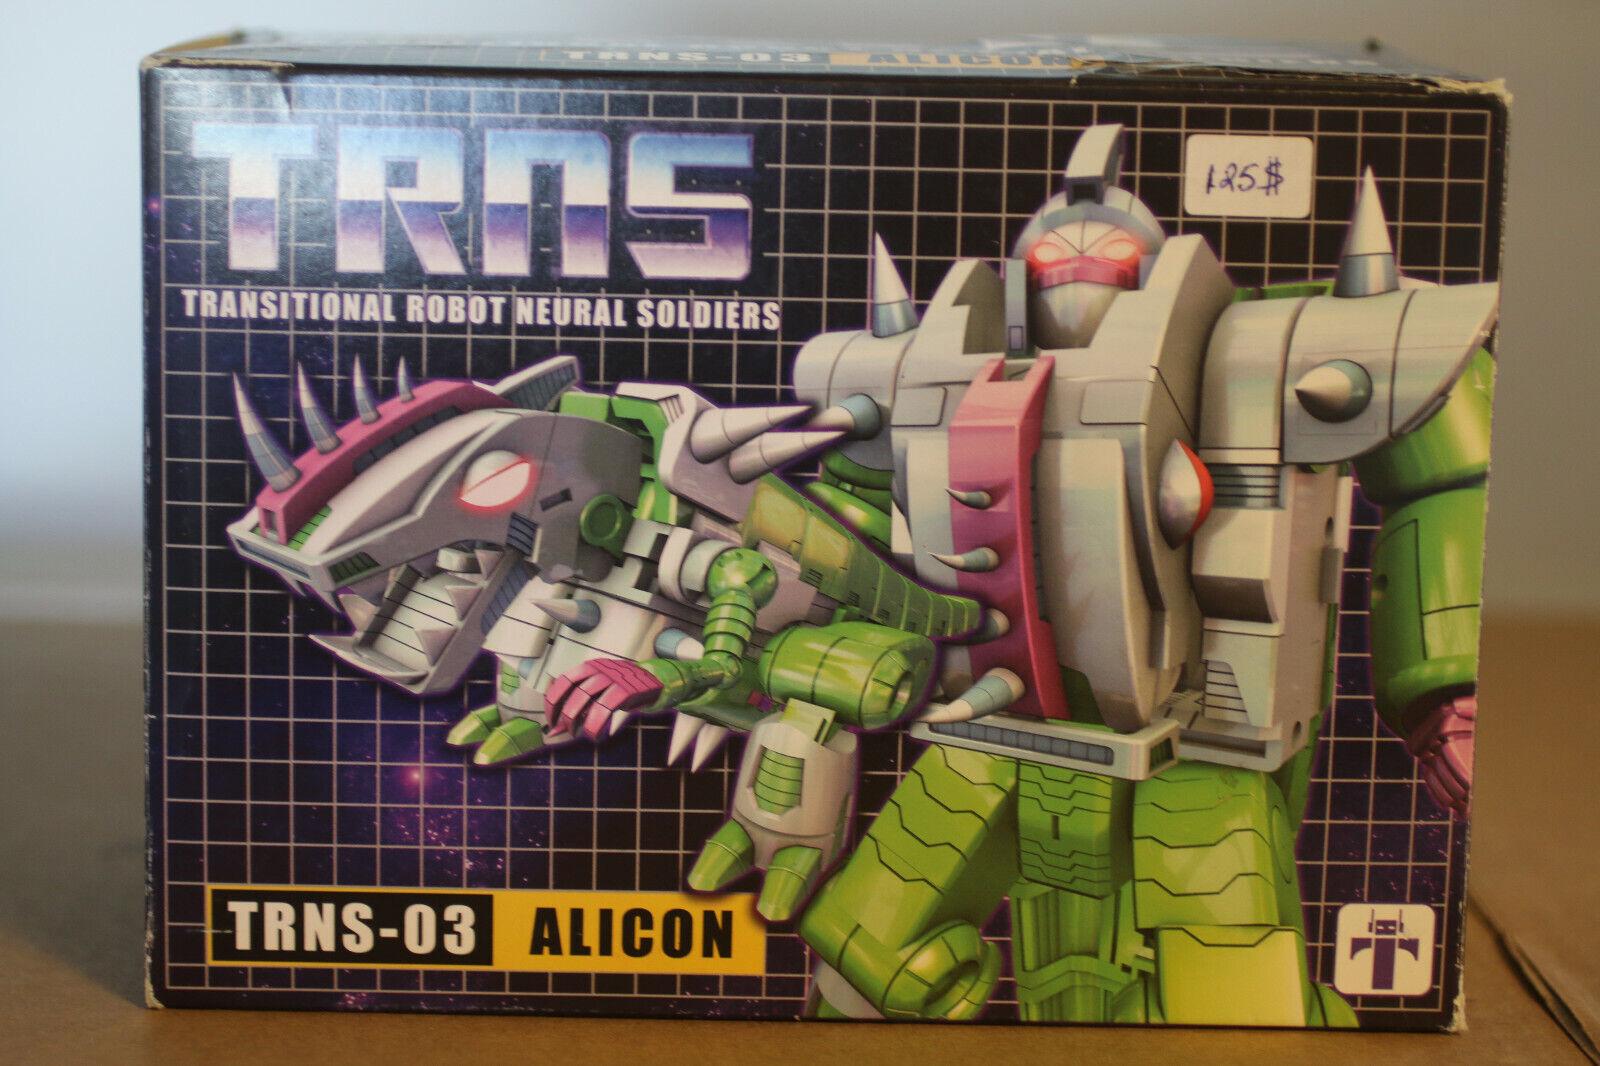 Transformers TRNS - 03 imposible Juguetes Quintesson Alicon Completo En Caja